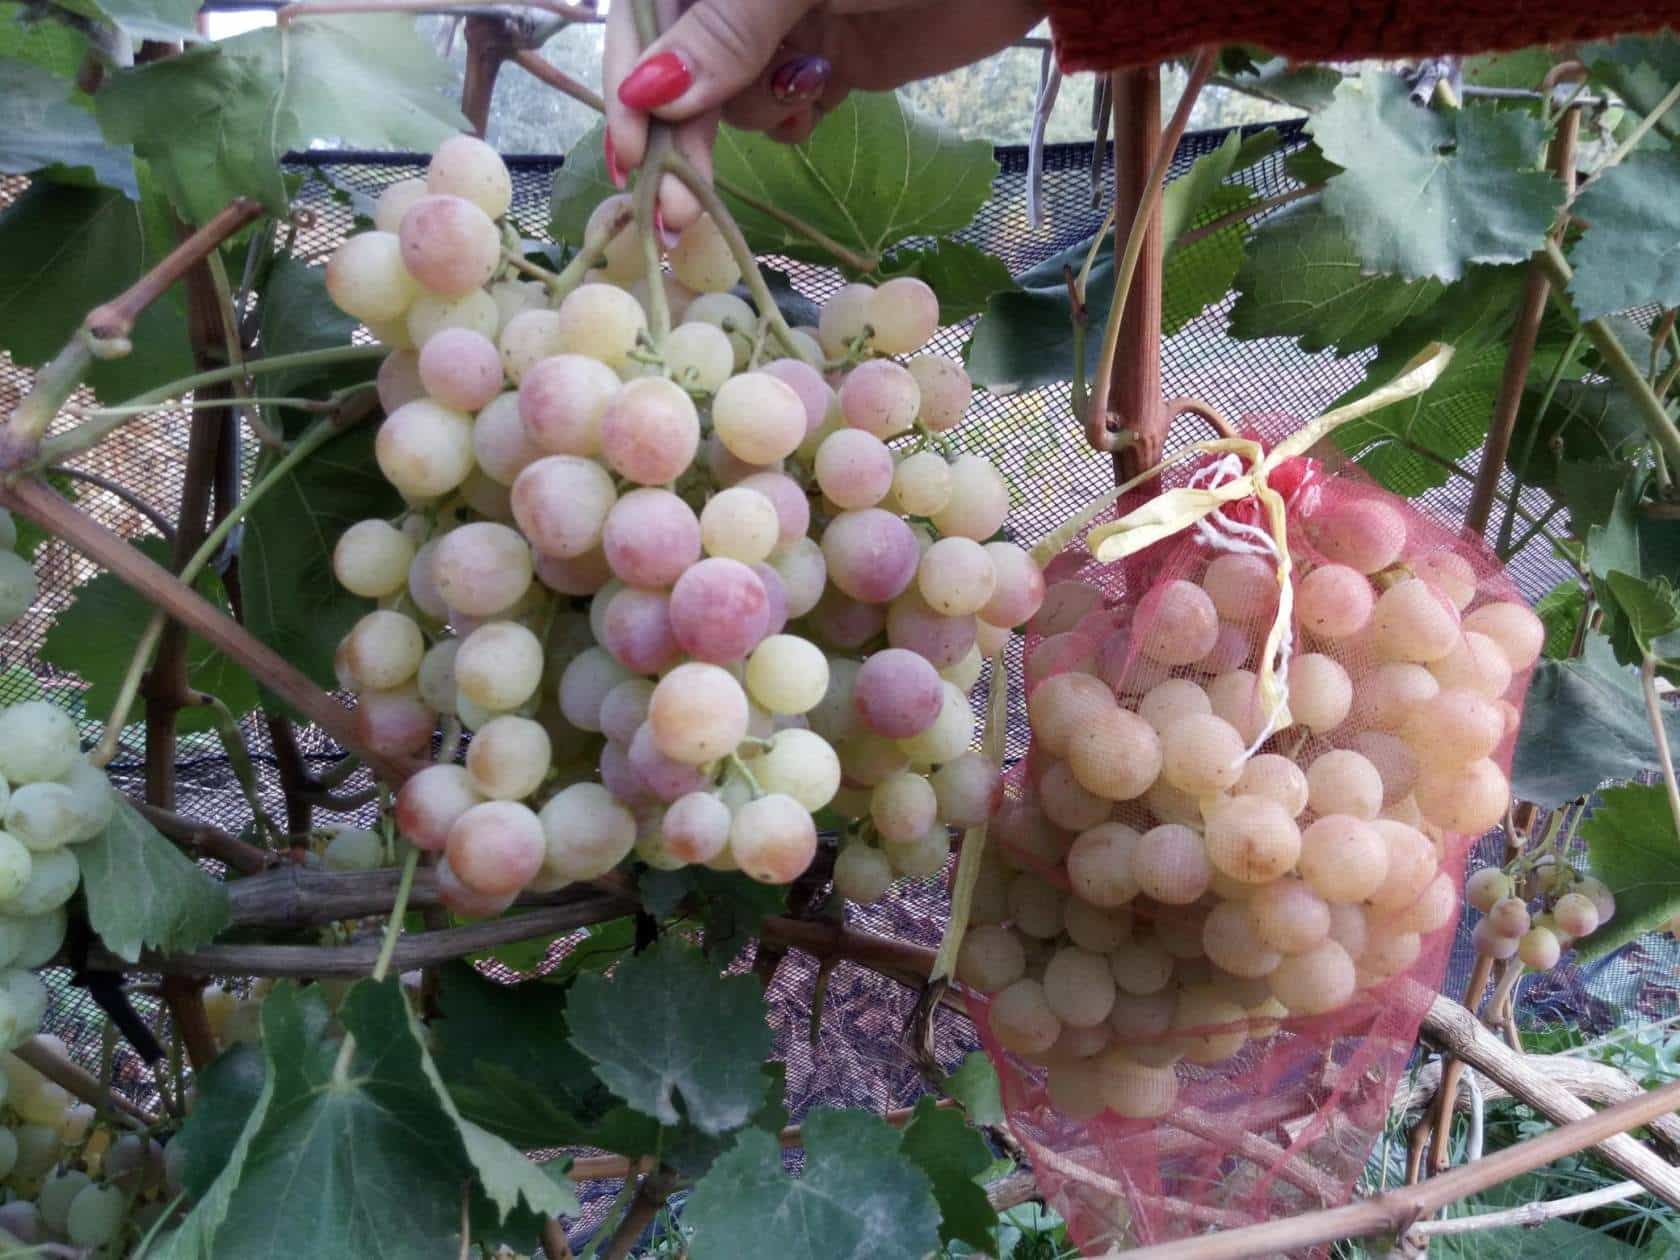 сорт винограда Нимранг